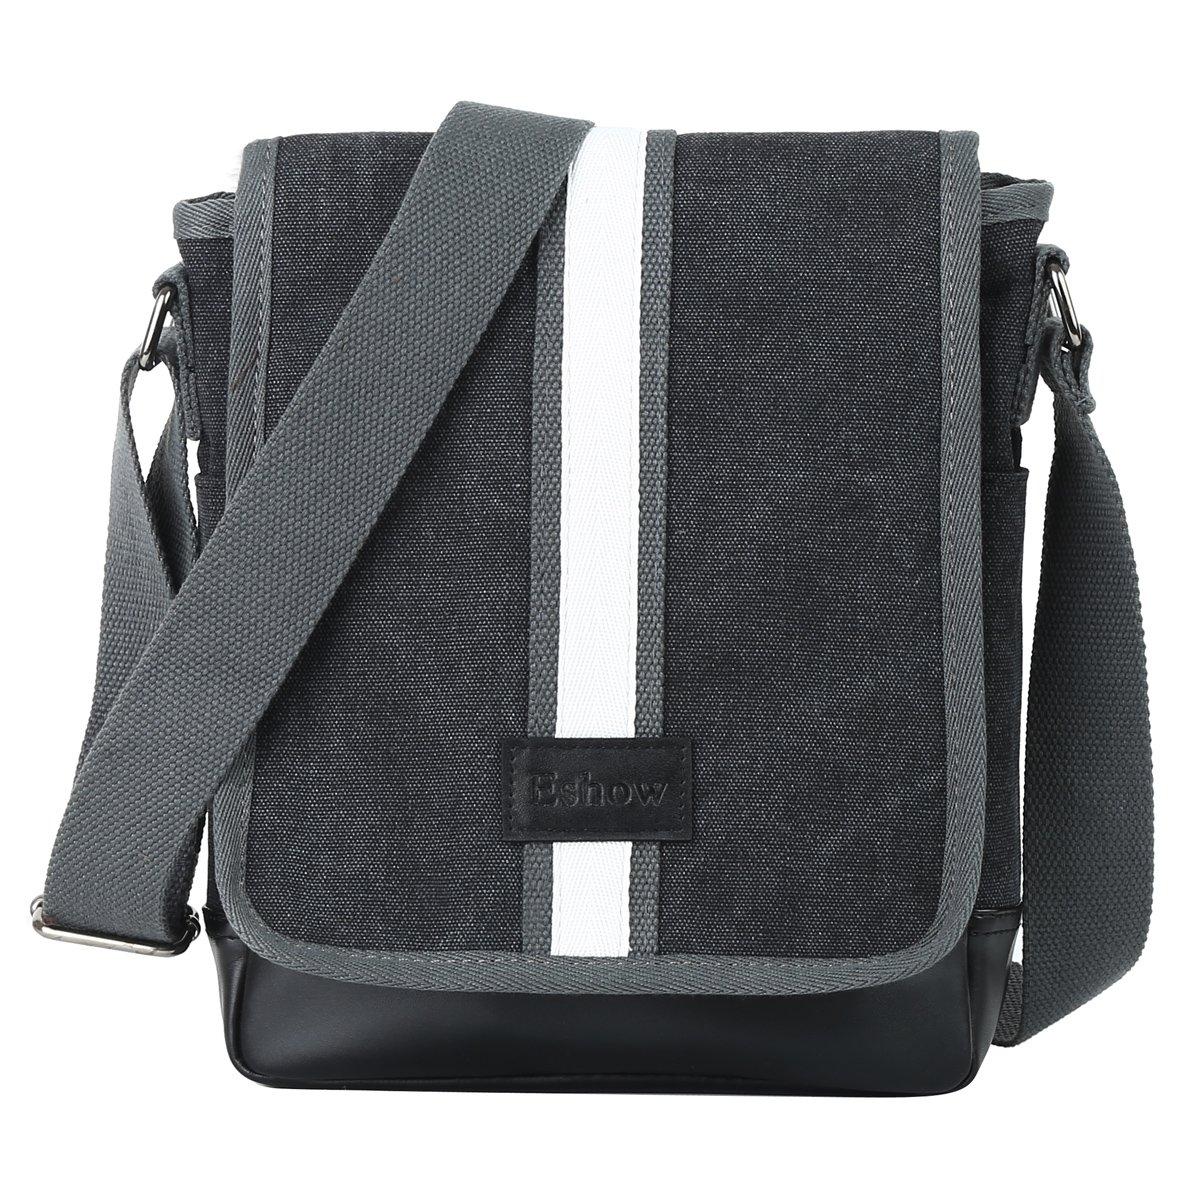 Eshow Men s Messenger Bag Shoulder Bag for Men Small Crossbody Bag Satchel for Work School